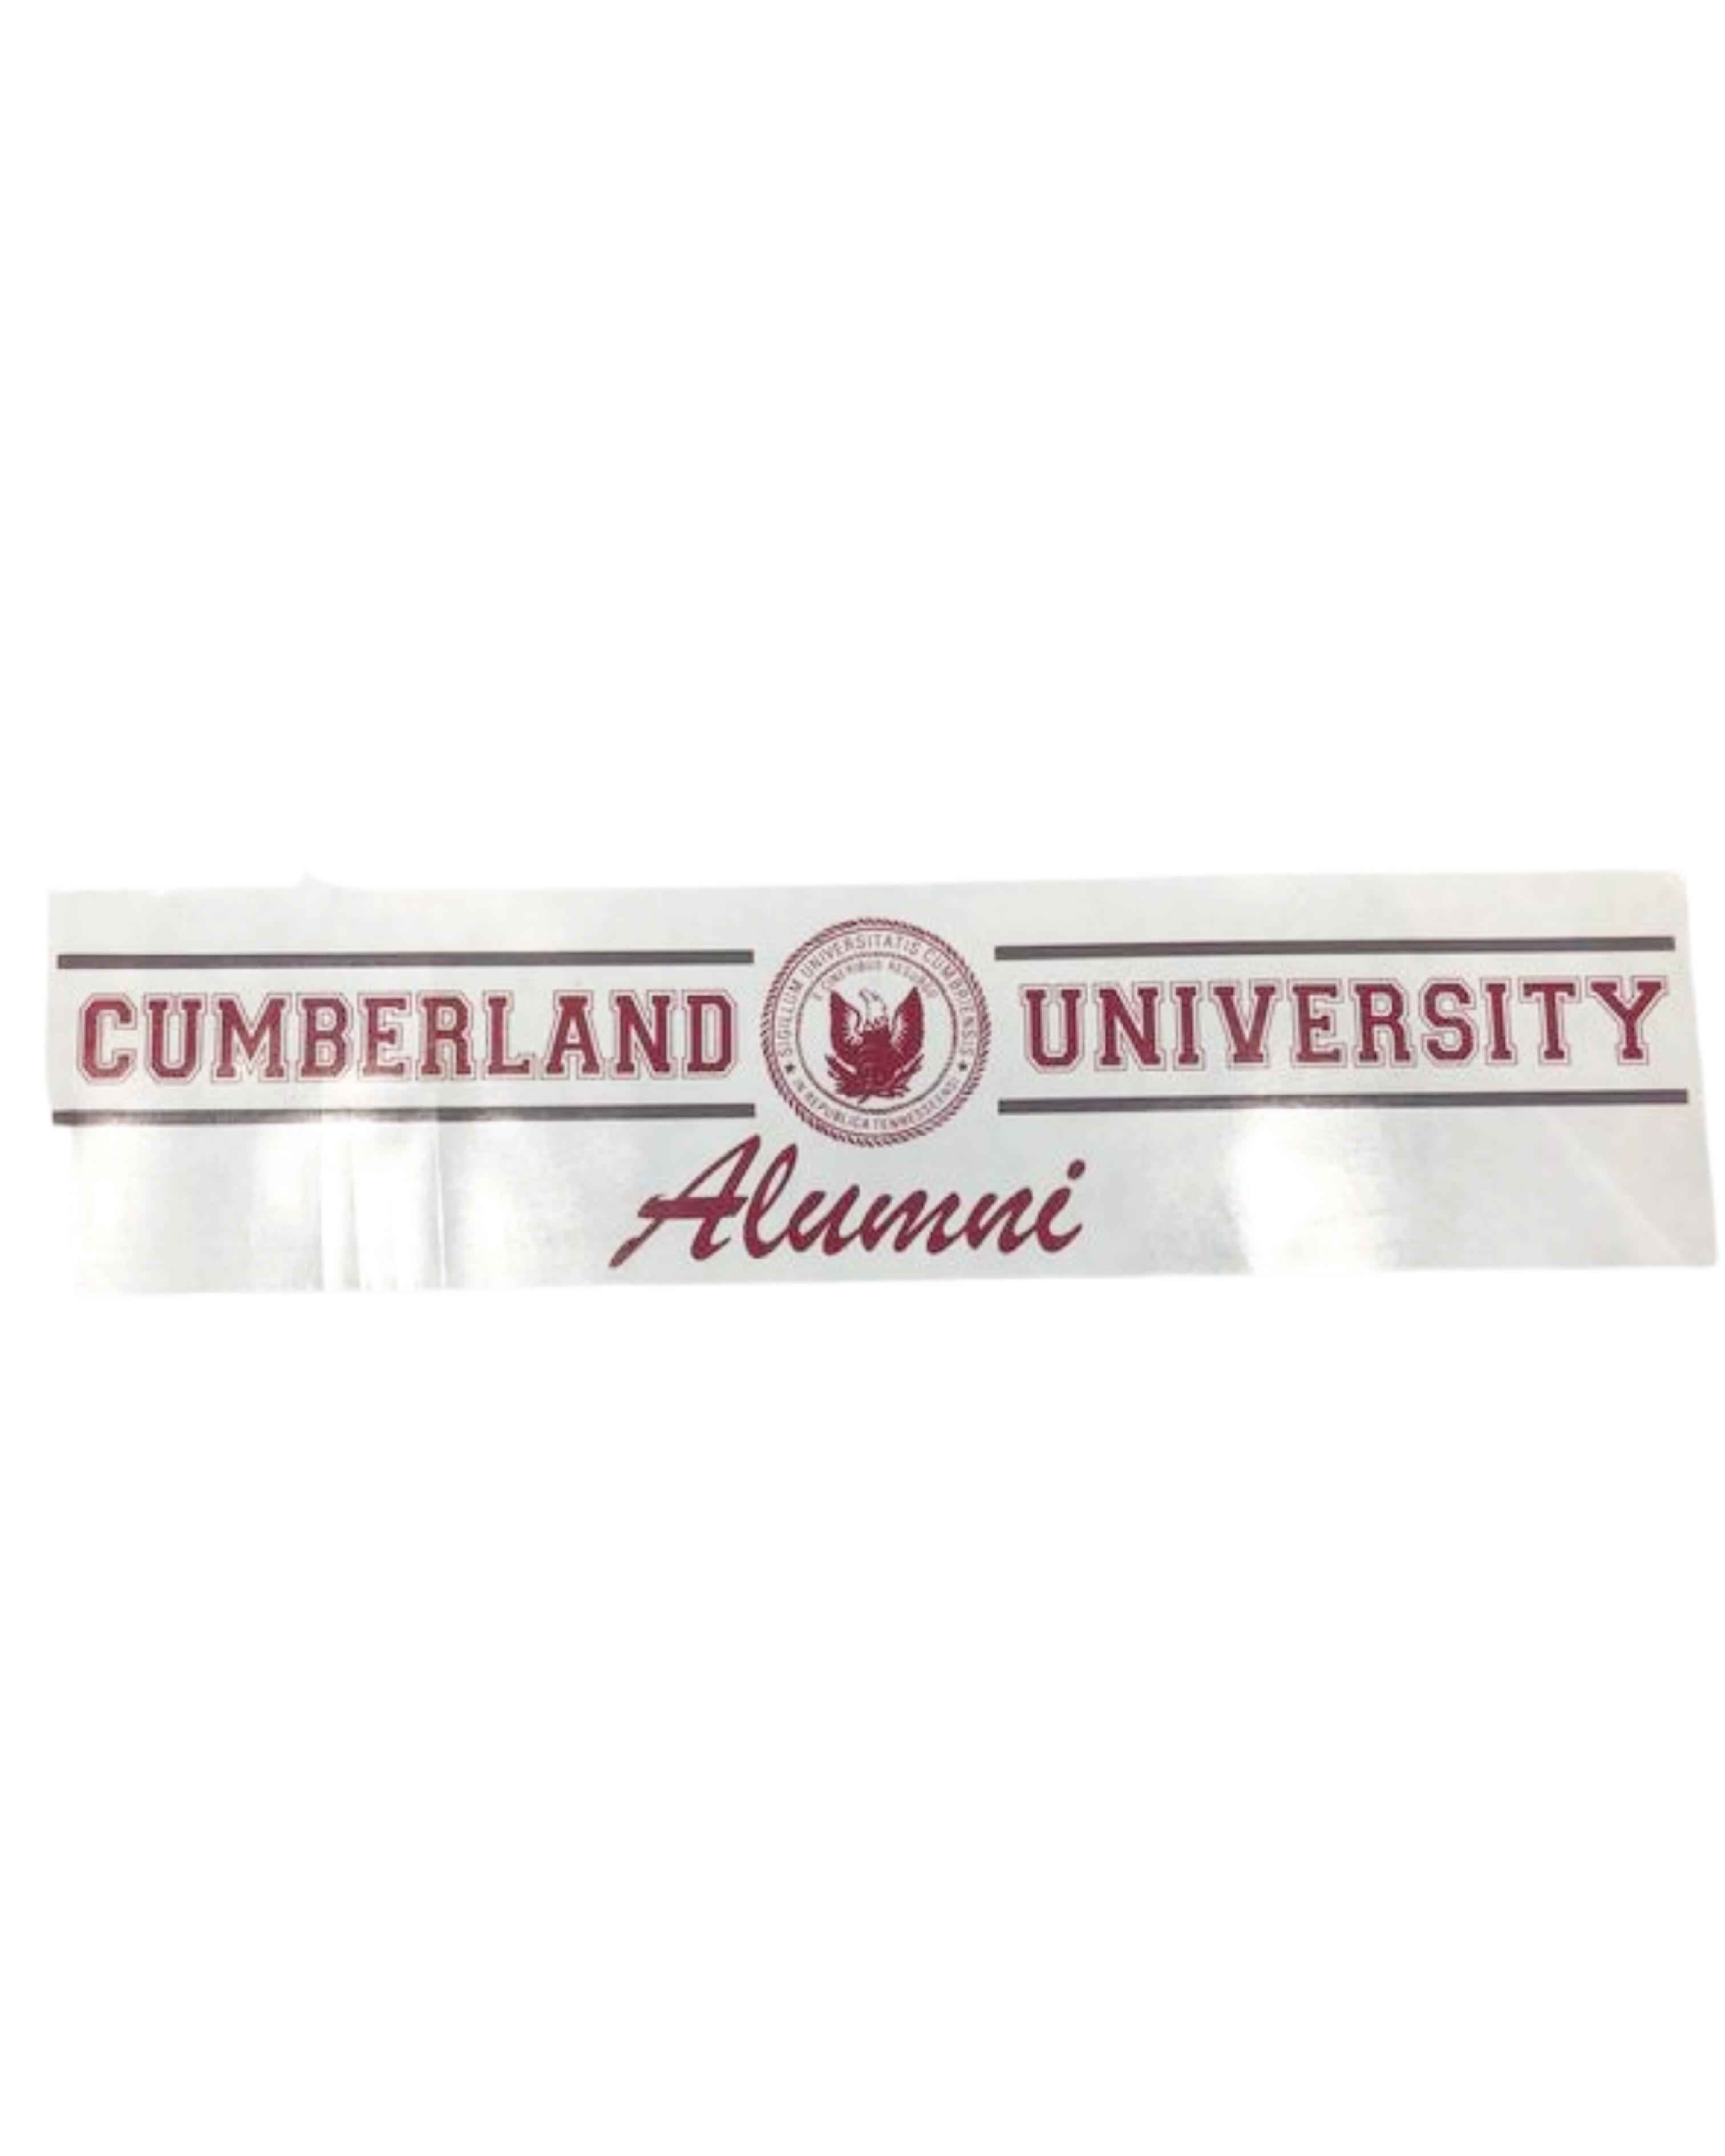 Cumberland University Alumni Decal